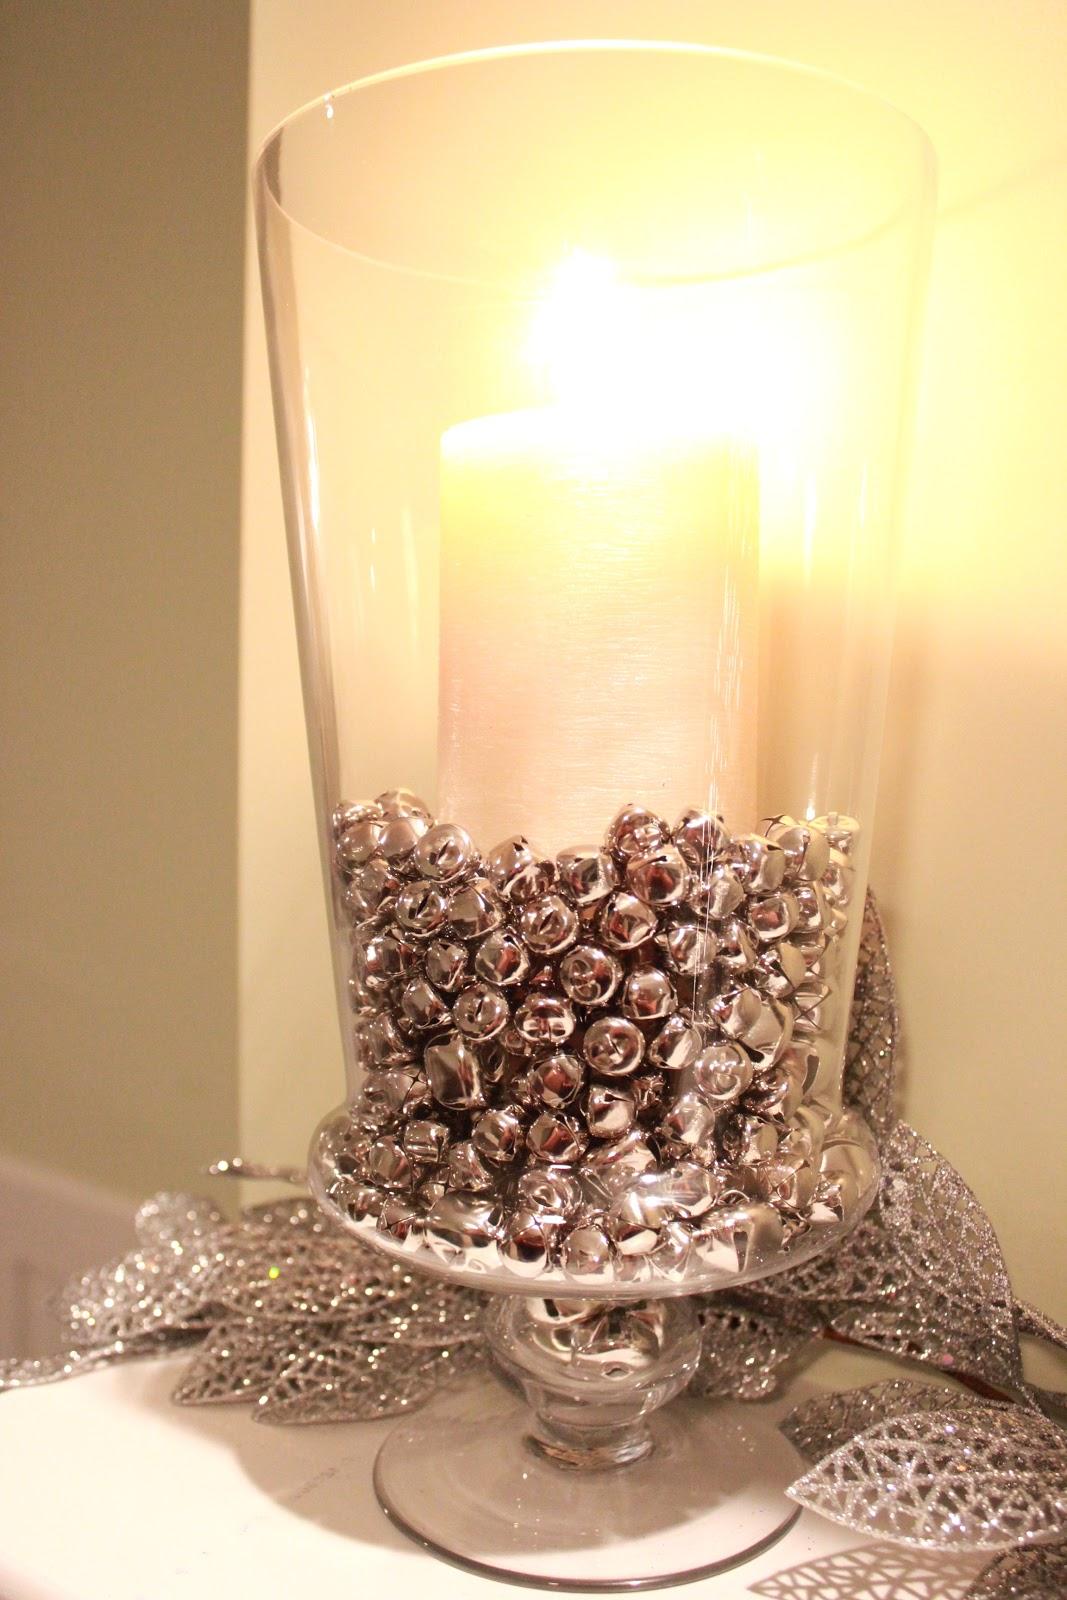 Cooper chloe diy christmas decor wednesday december 5 2012 reviewsmspy